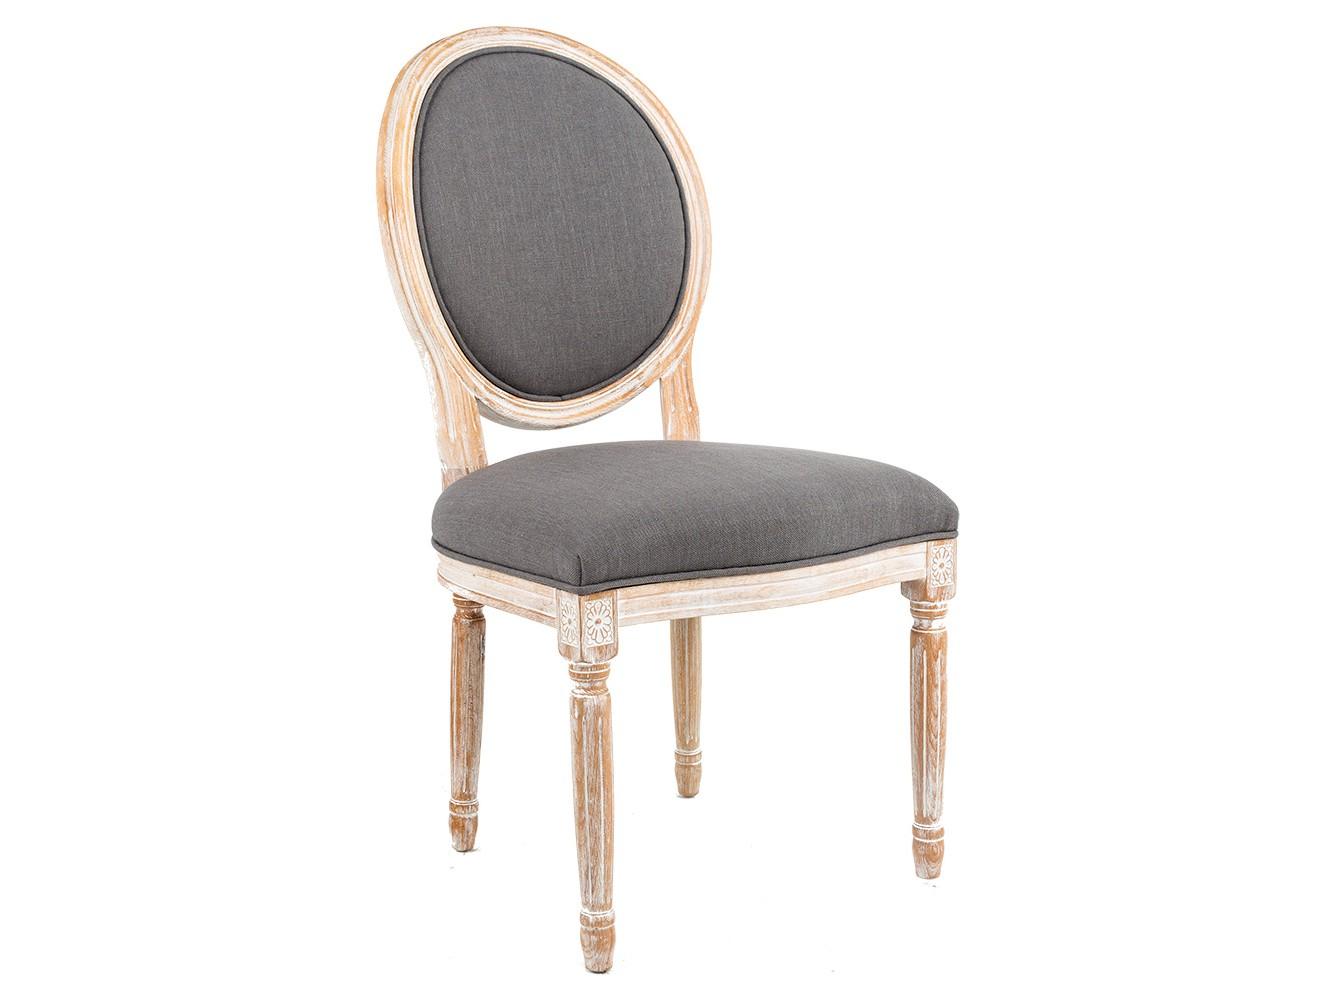 Кухонный стул Object Desire 15438259 от thefurnish